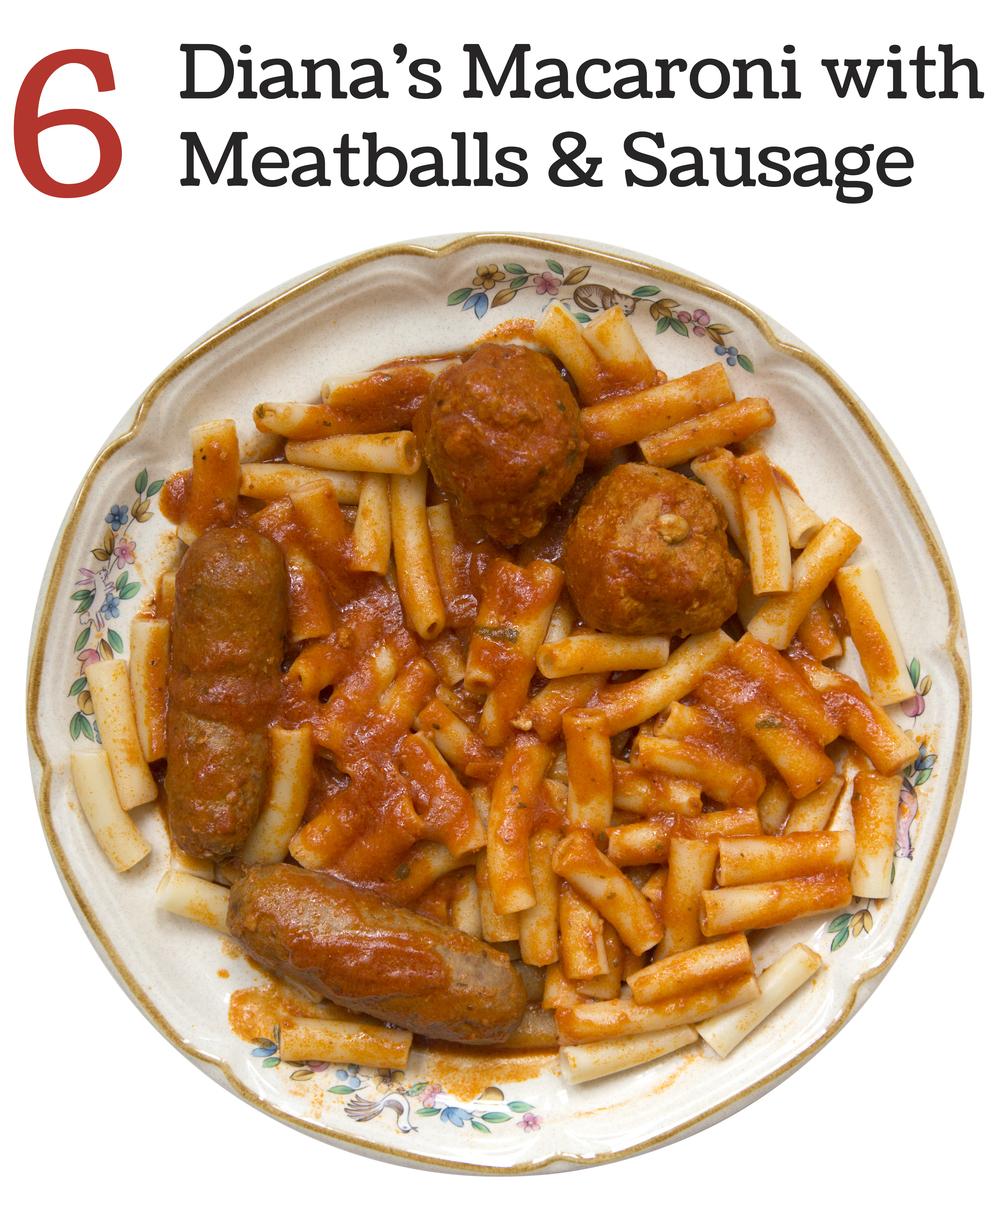 6 Dana's Macaroni with Meatballs & Sausage